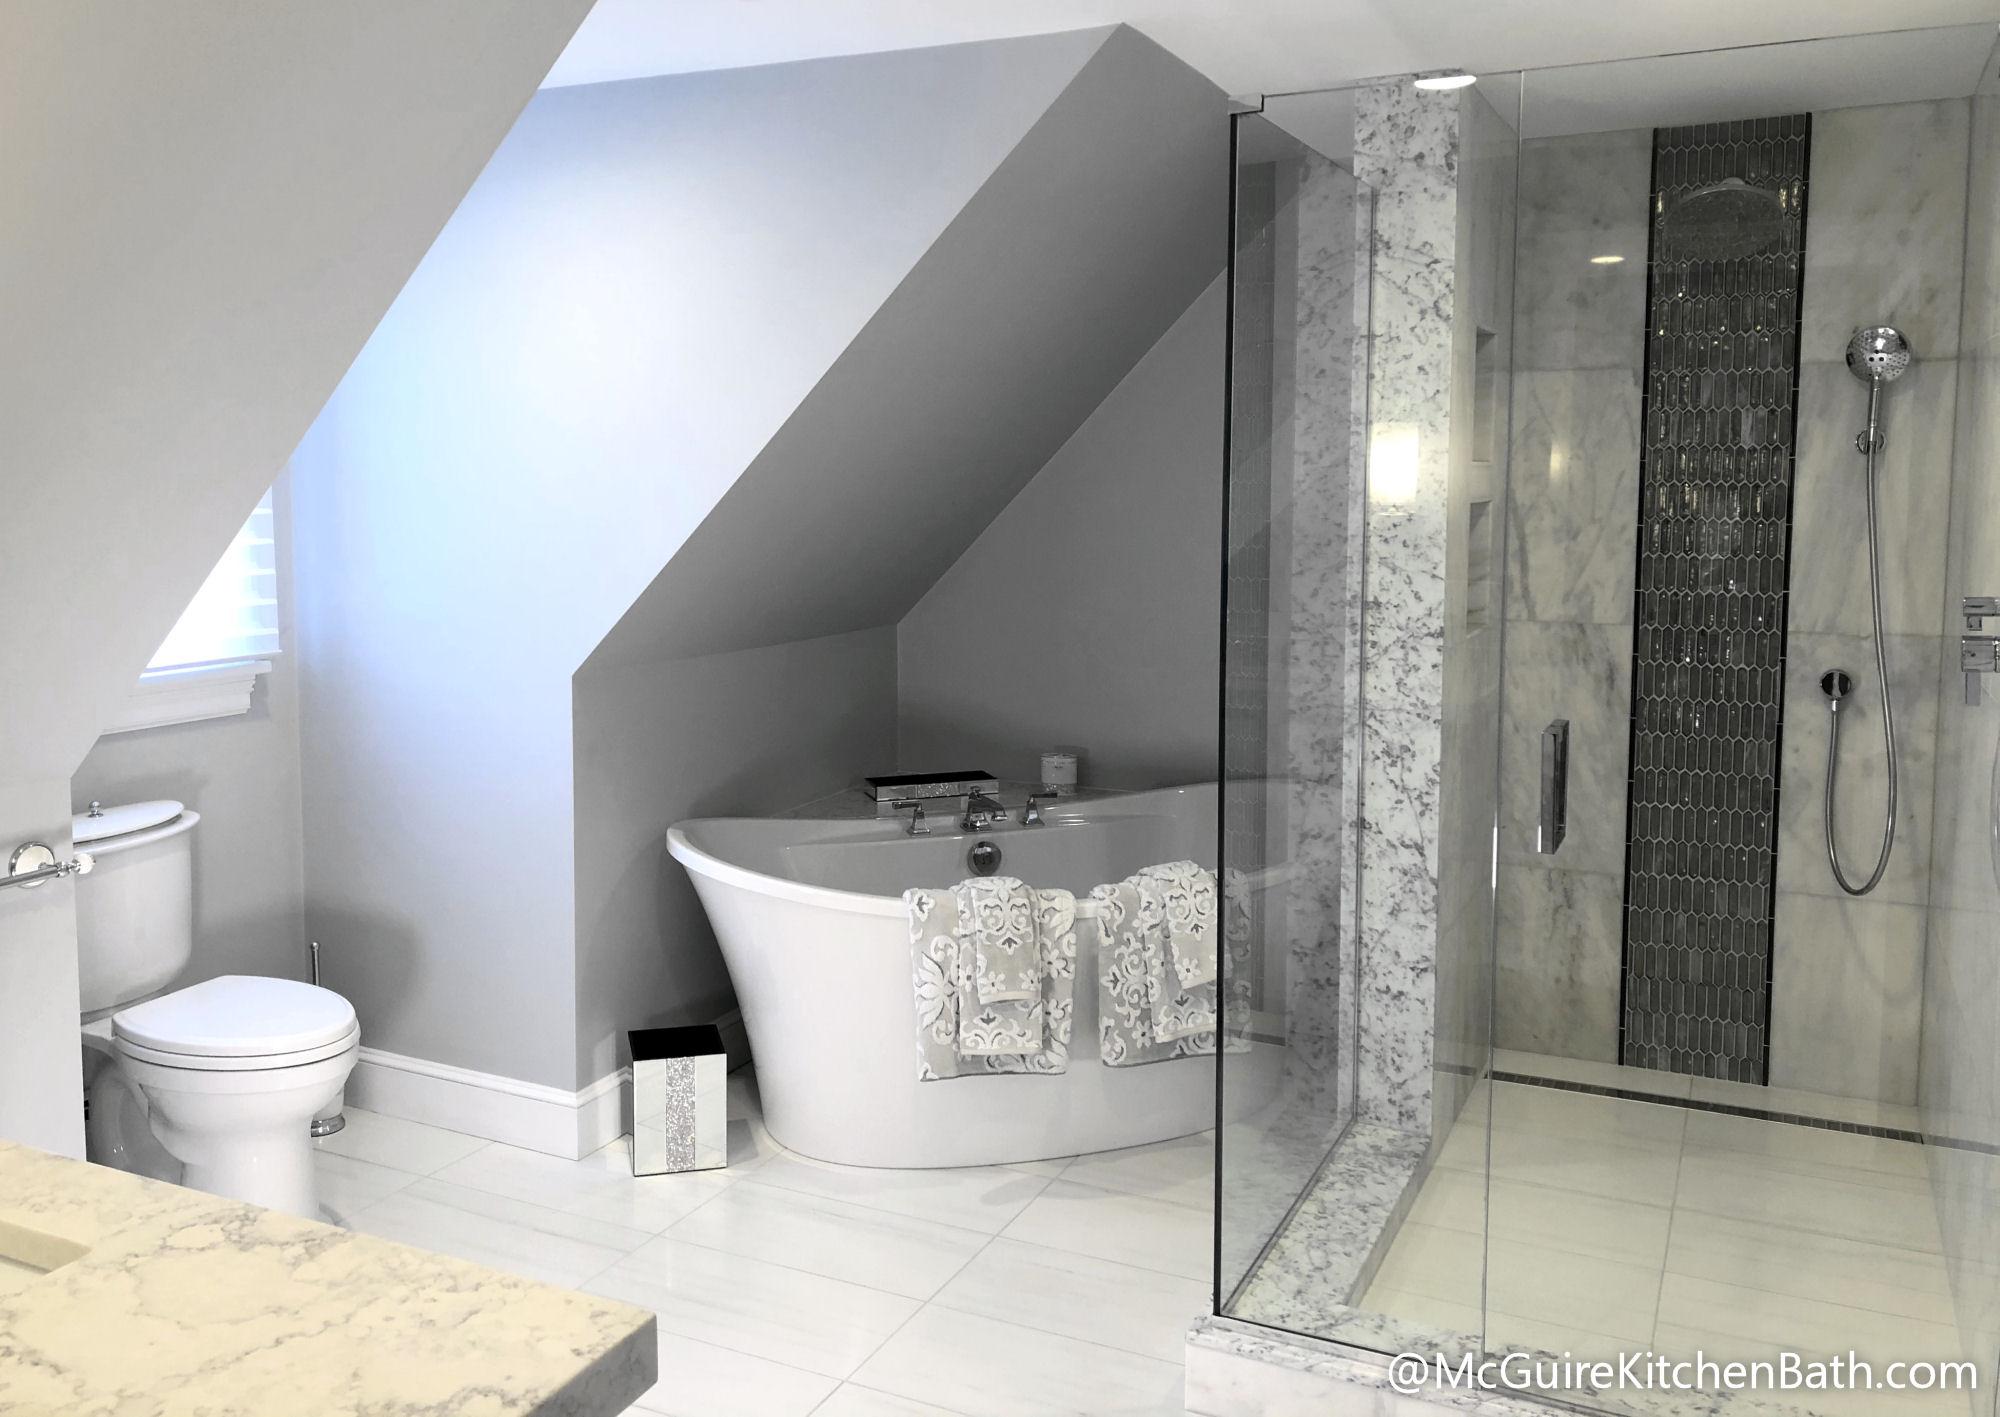 Glad Master Bathroom Remodel in Stoneham MA